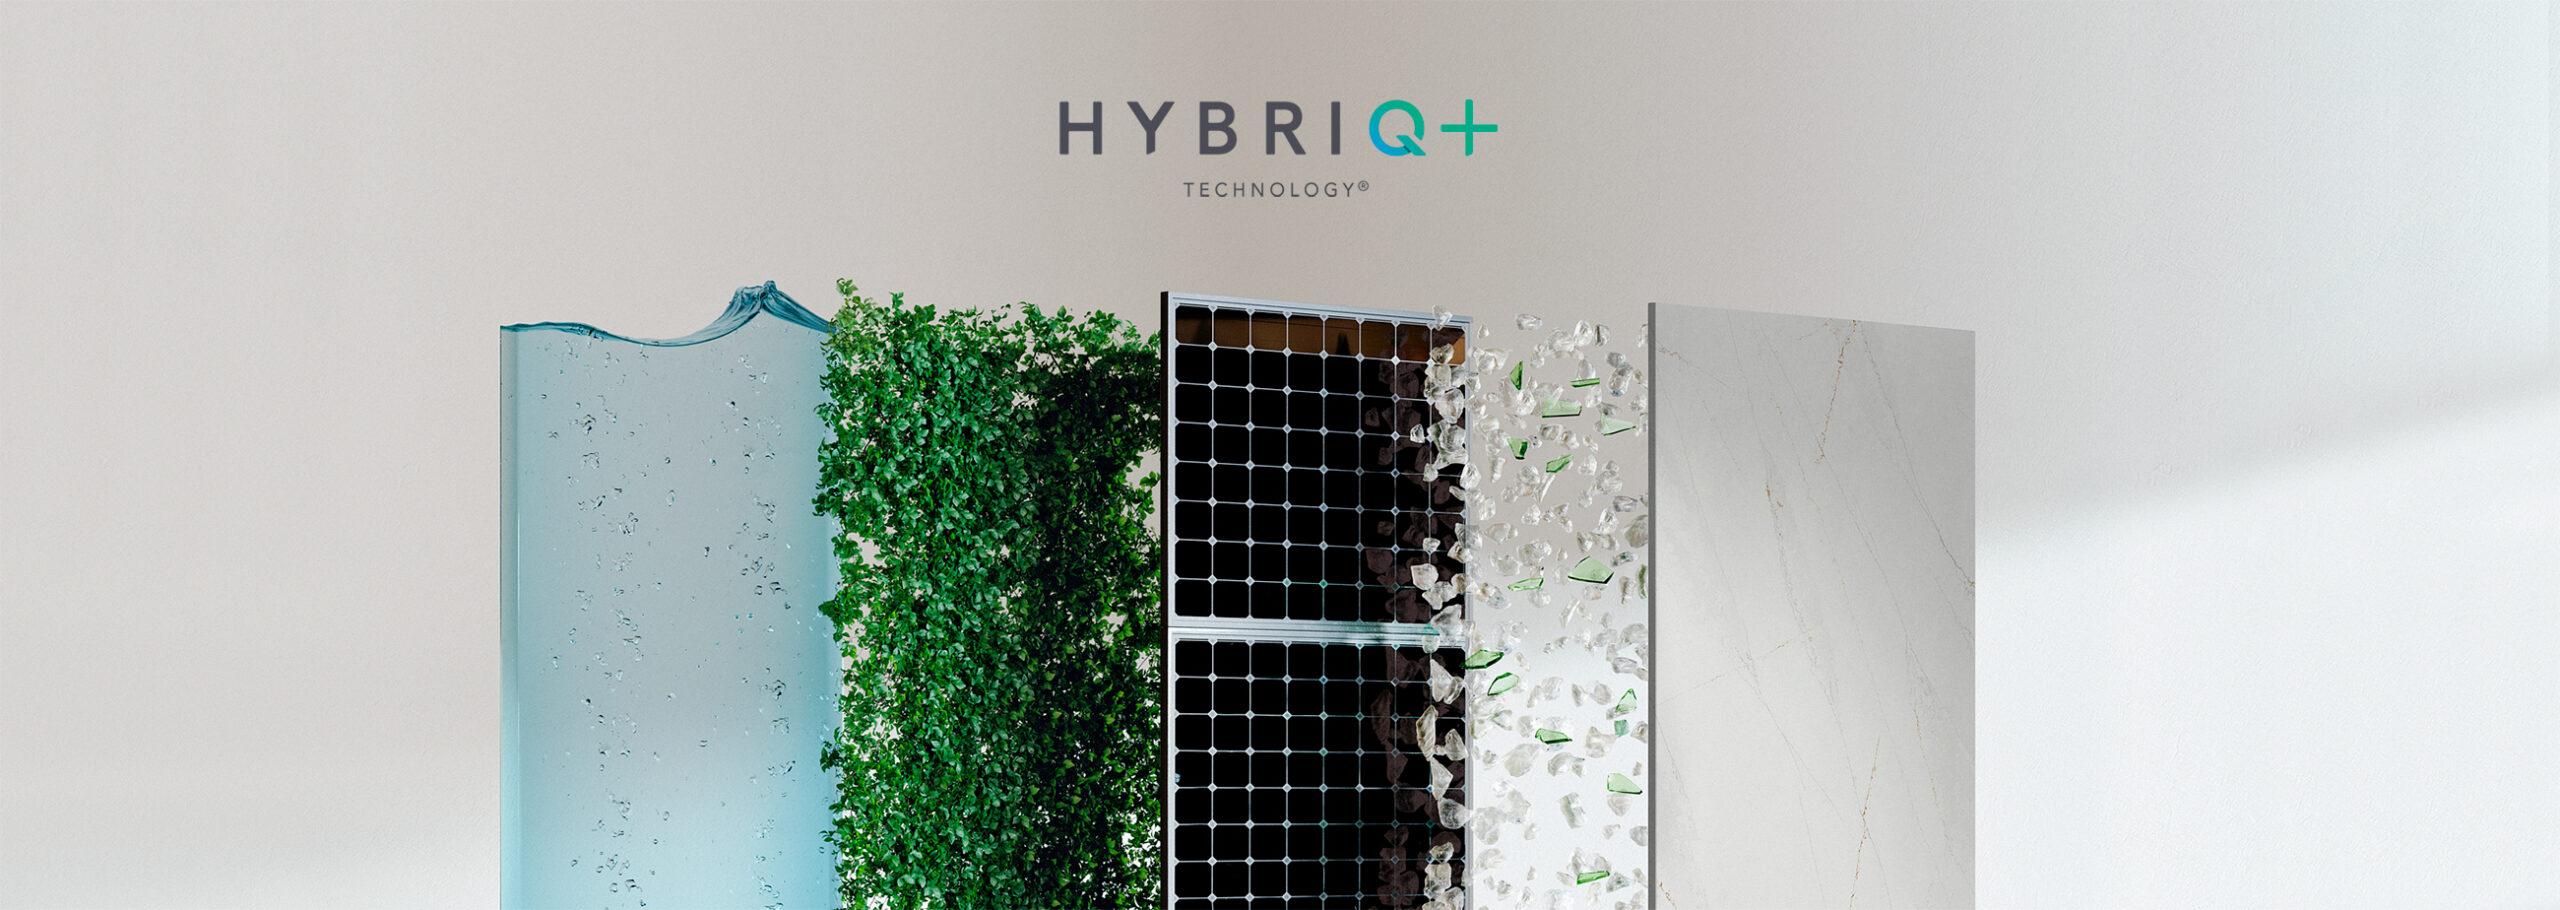 Image of Concepto Tablas Hybriq scaled in What is Silestone - Cosentino